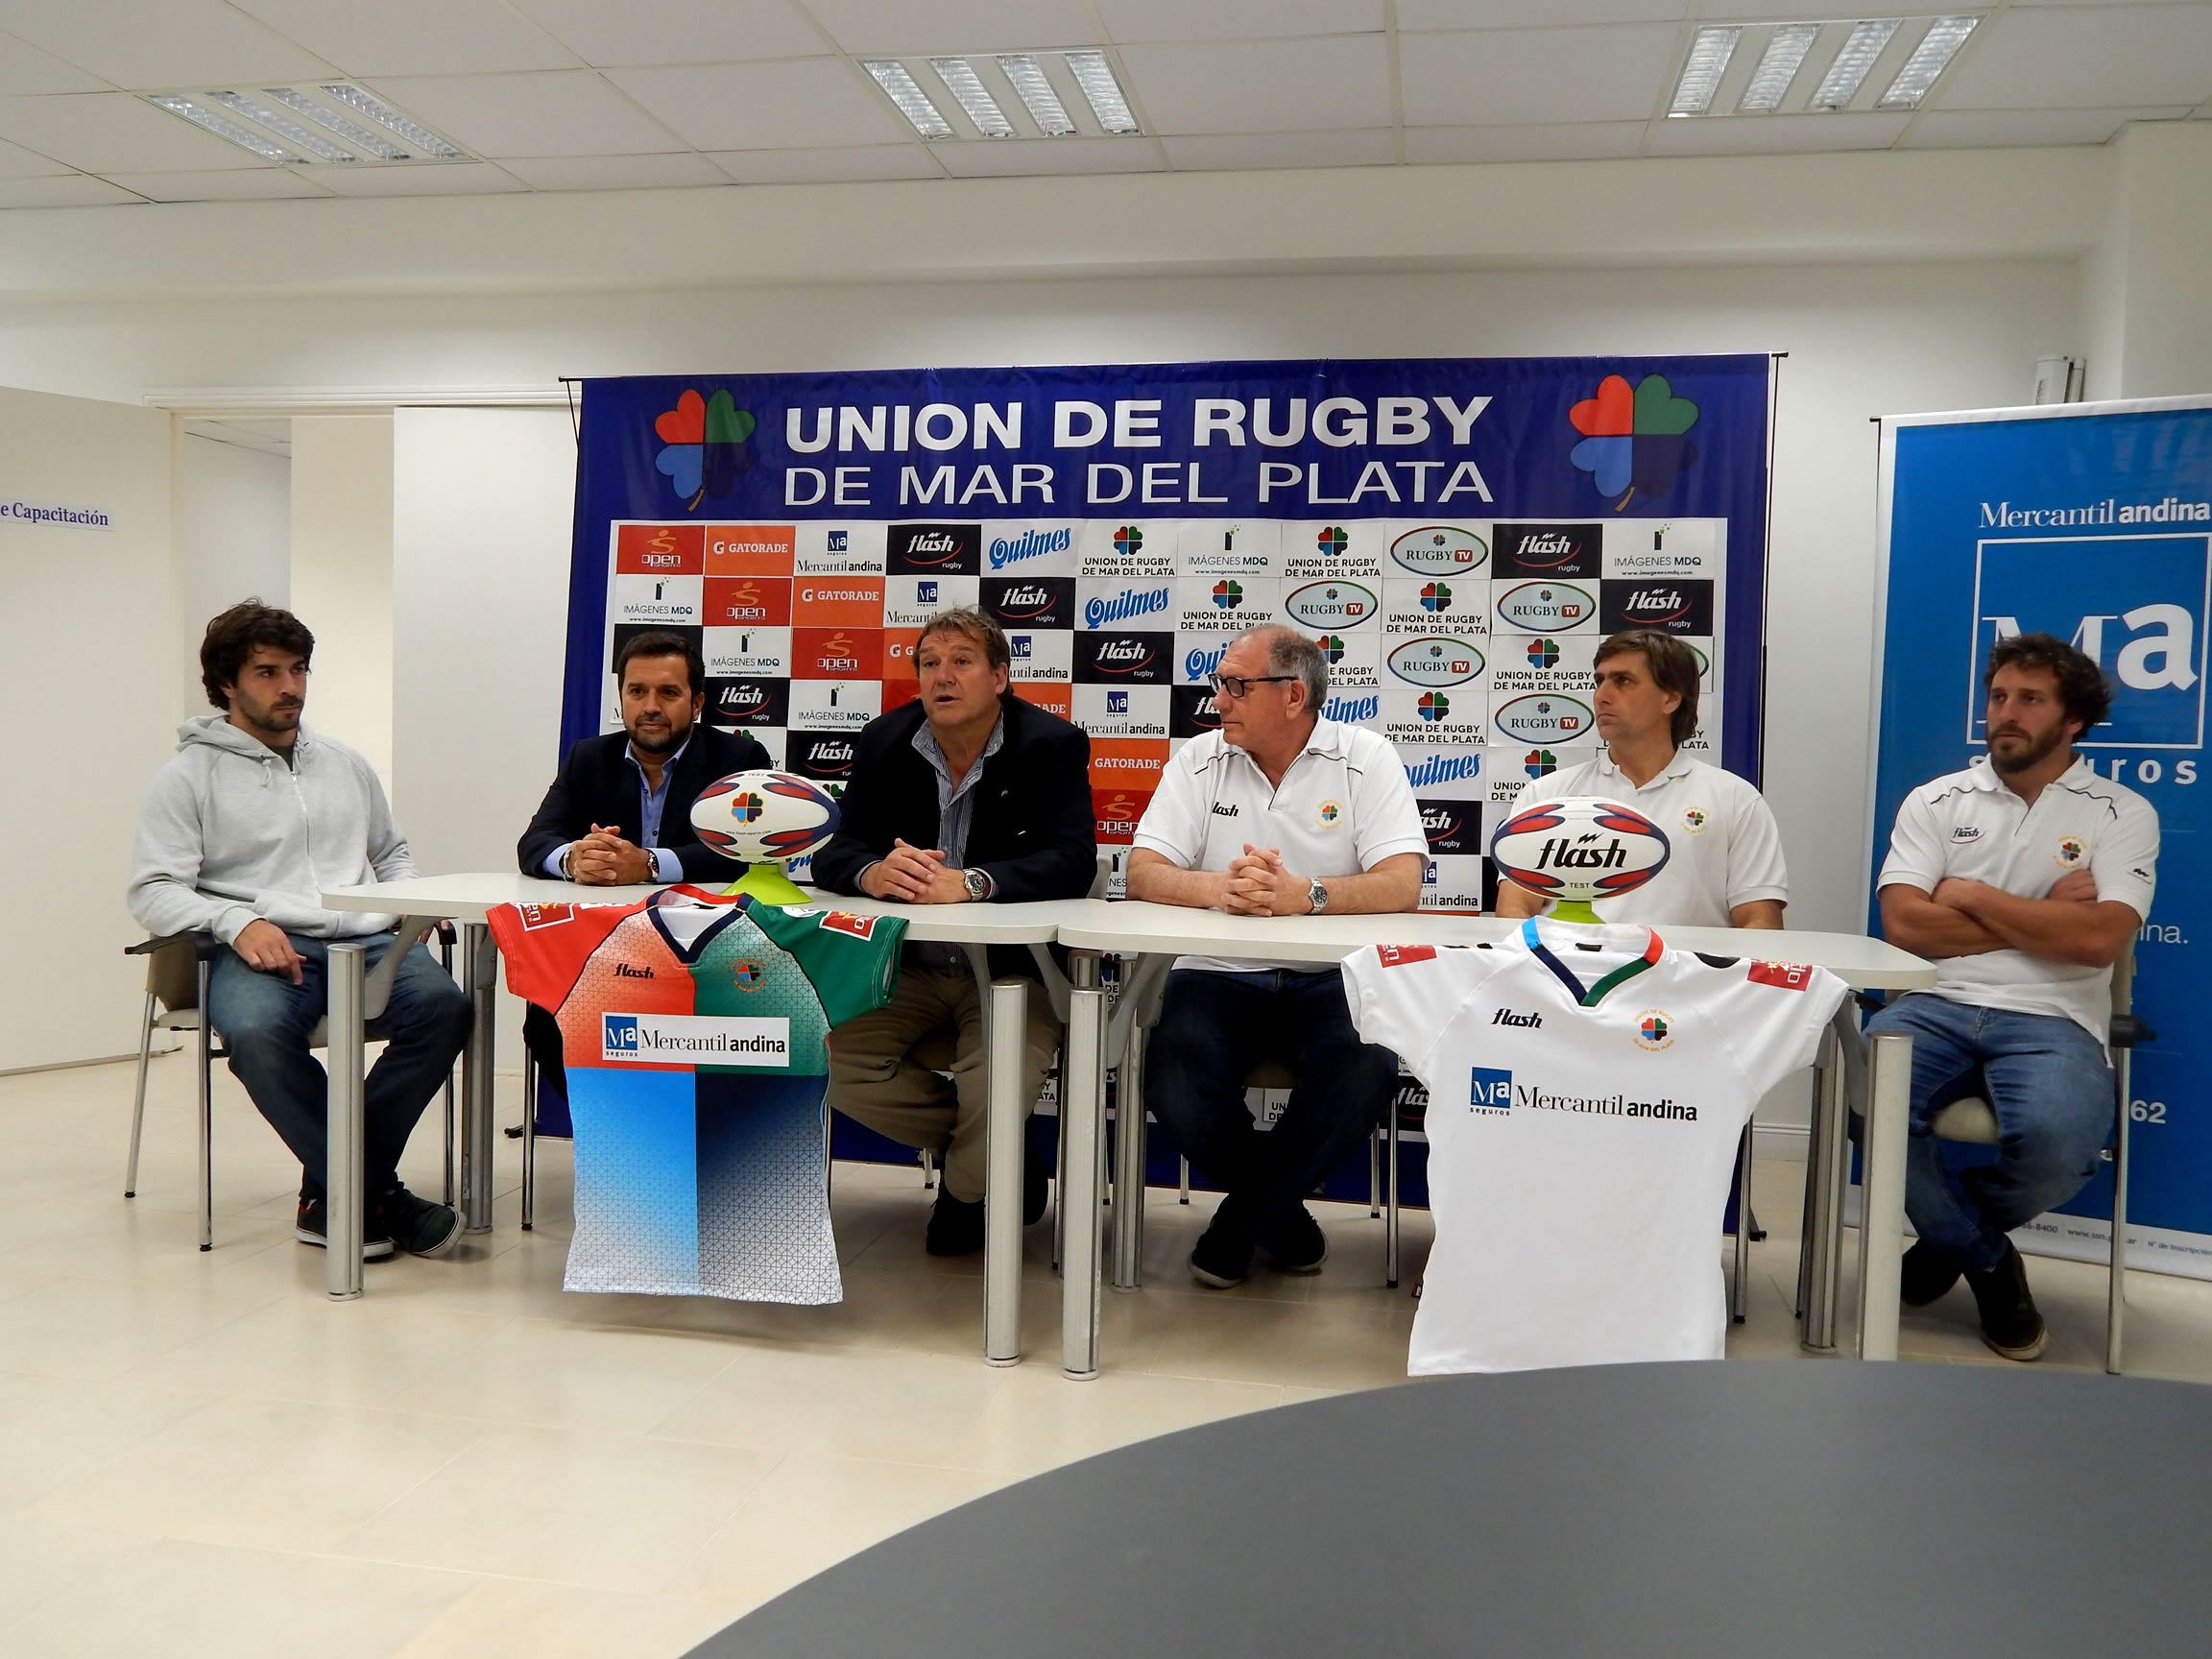 La conferencia realizada esta tarde. (Foto: Prensa URMDP)